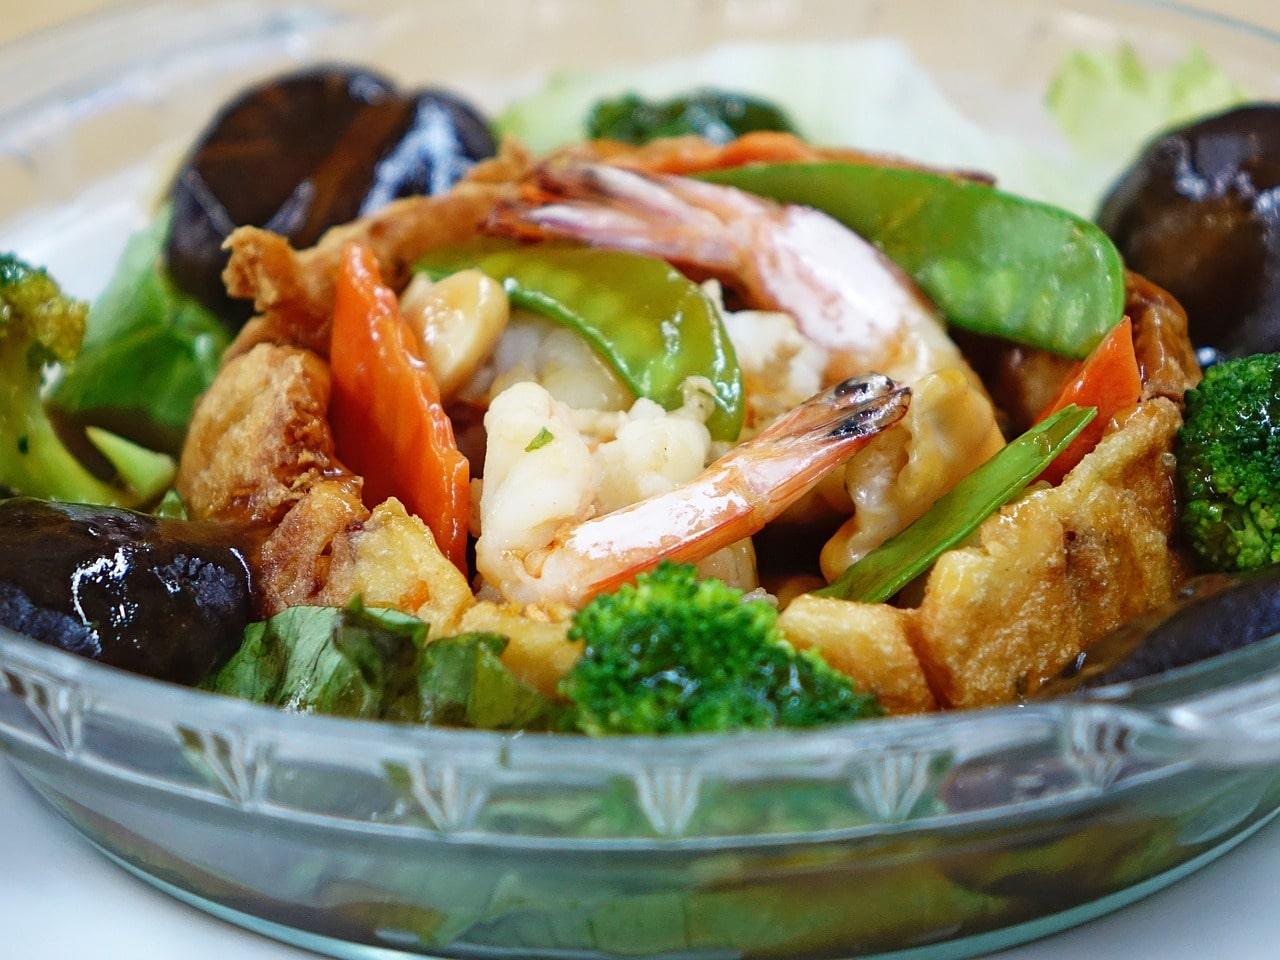 10 Best Chinese Restaurants in Nairobi